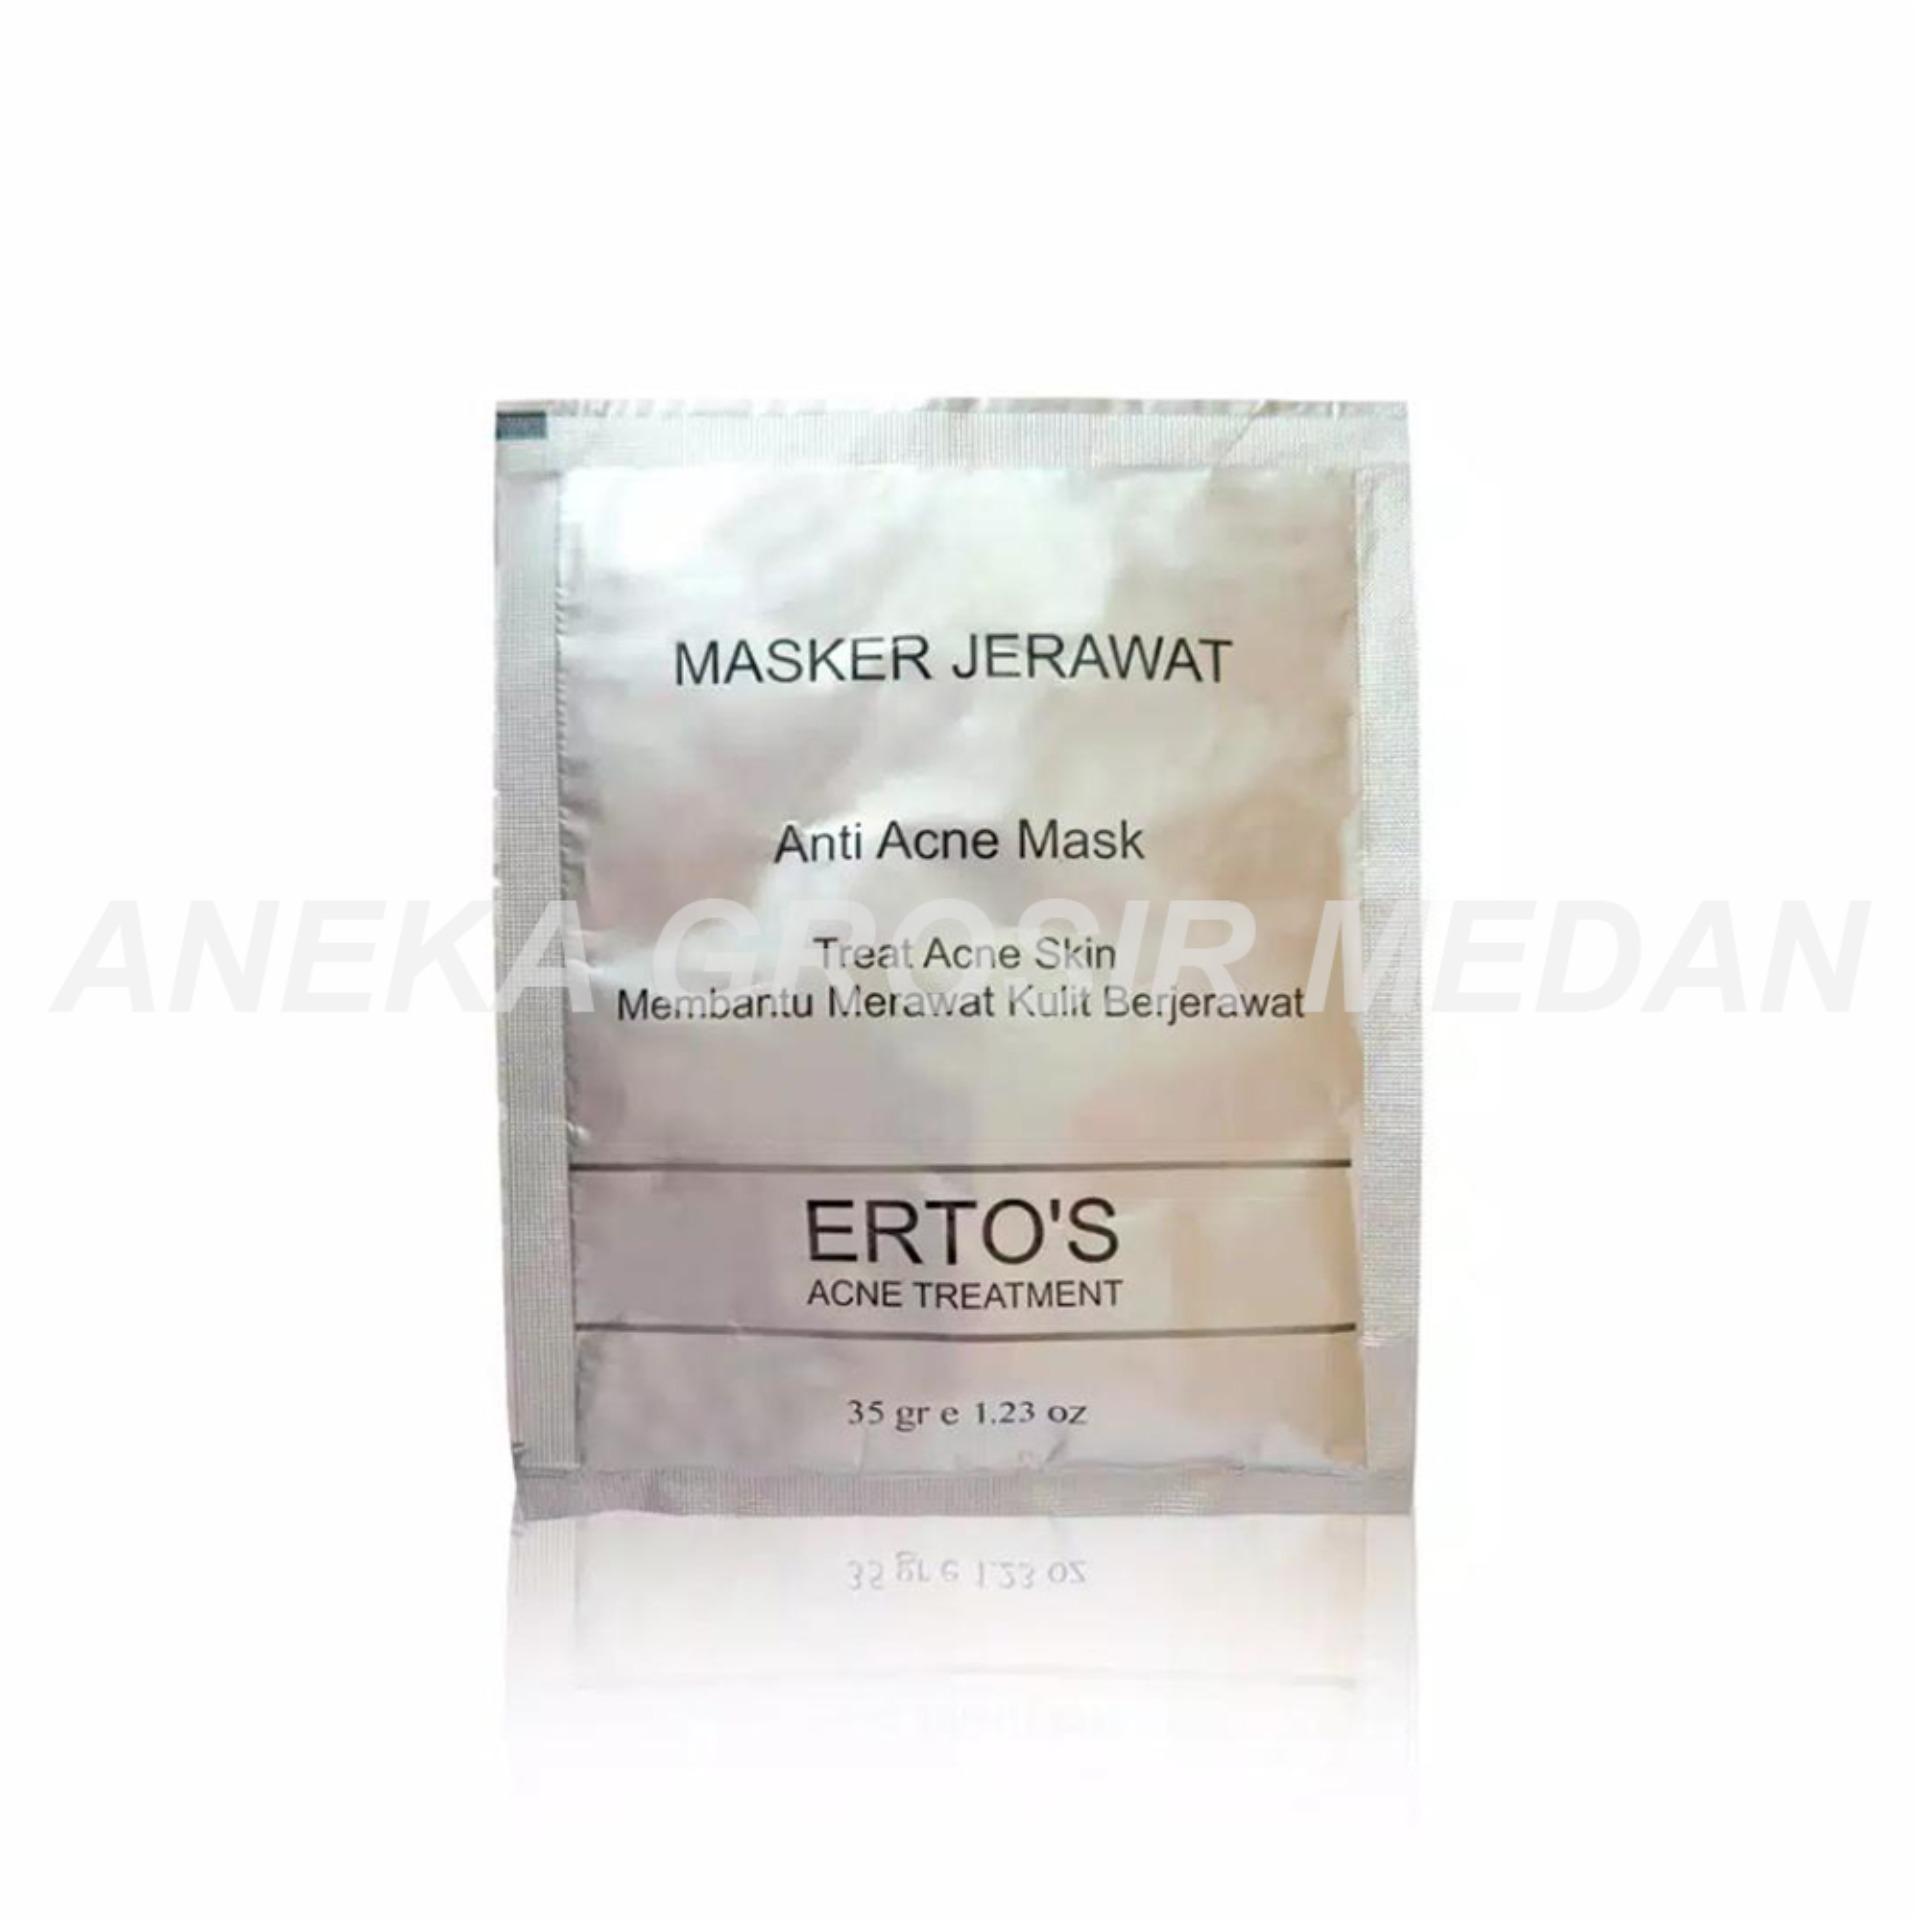 Beli Bioaqua Carbon Active Charcoal Black Mask Masker Pengangkat Komedo Ertos Acne Treatment